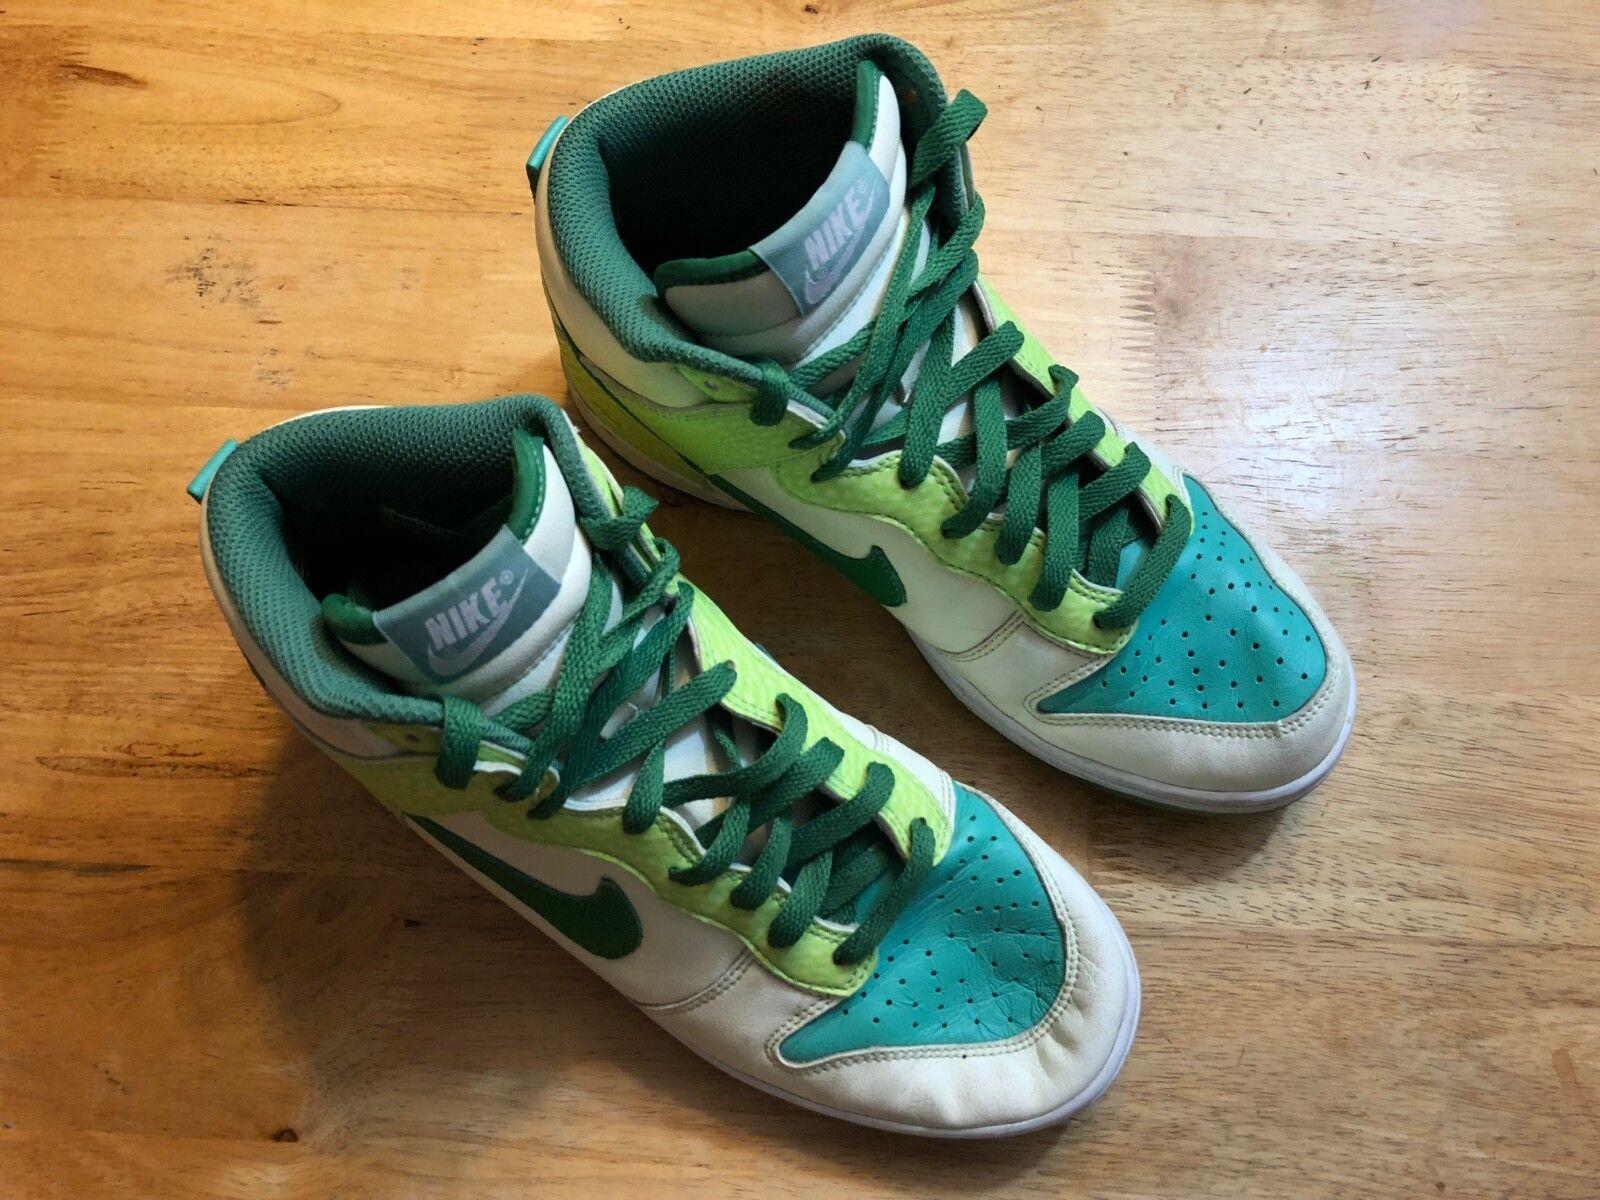 NIKE SB DUNK 312786-131 Sz 7.5 High Top Sneaker Glow In Dark White Green S11